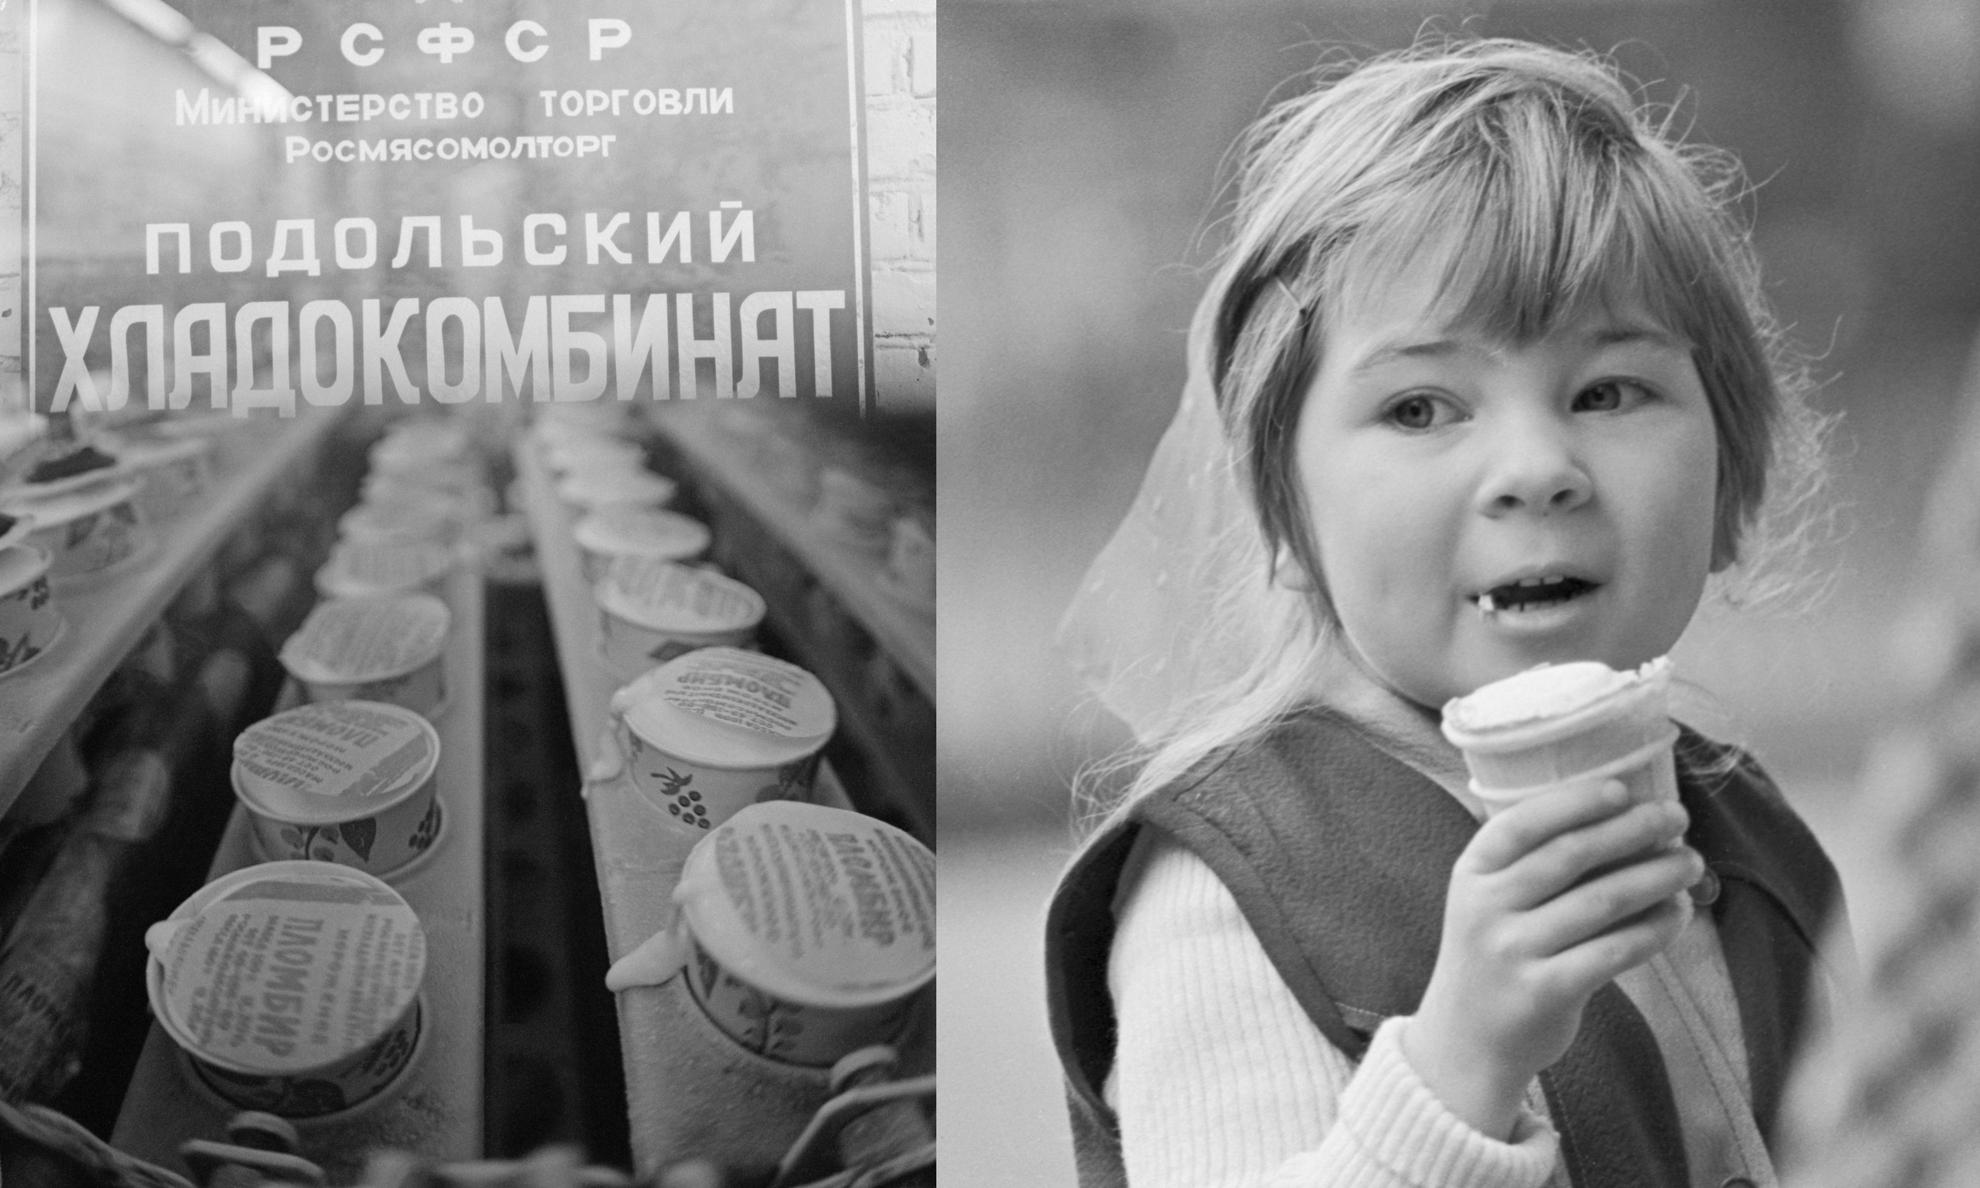 Фото © Фотохроника ТАСС / Мамонтов Сергей / Пахомова Людмила